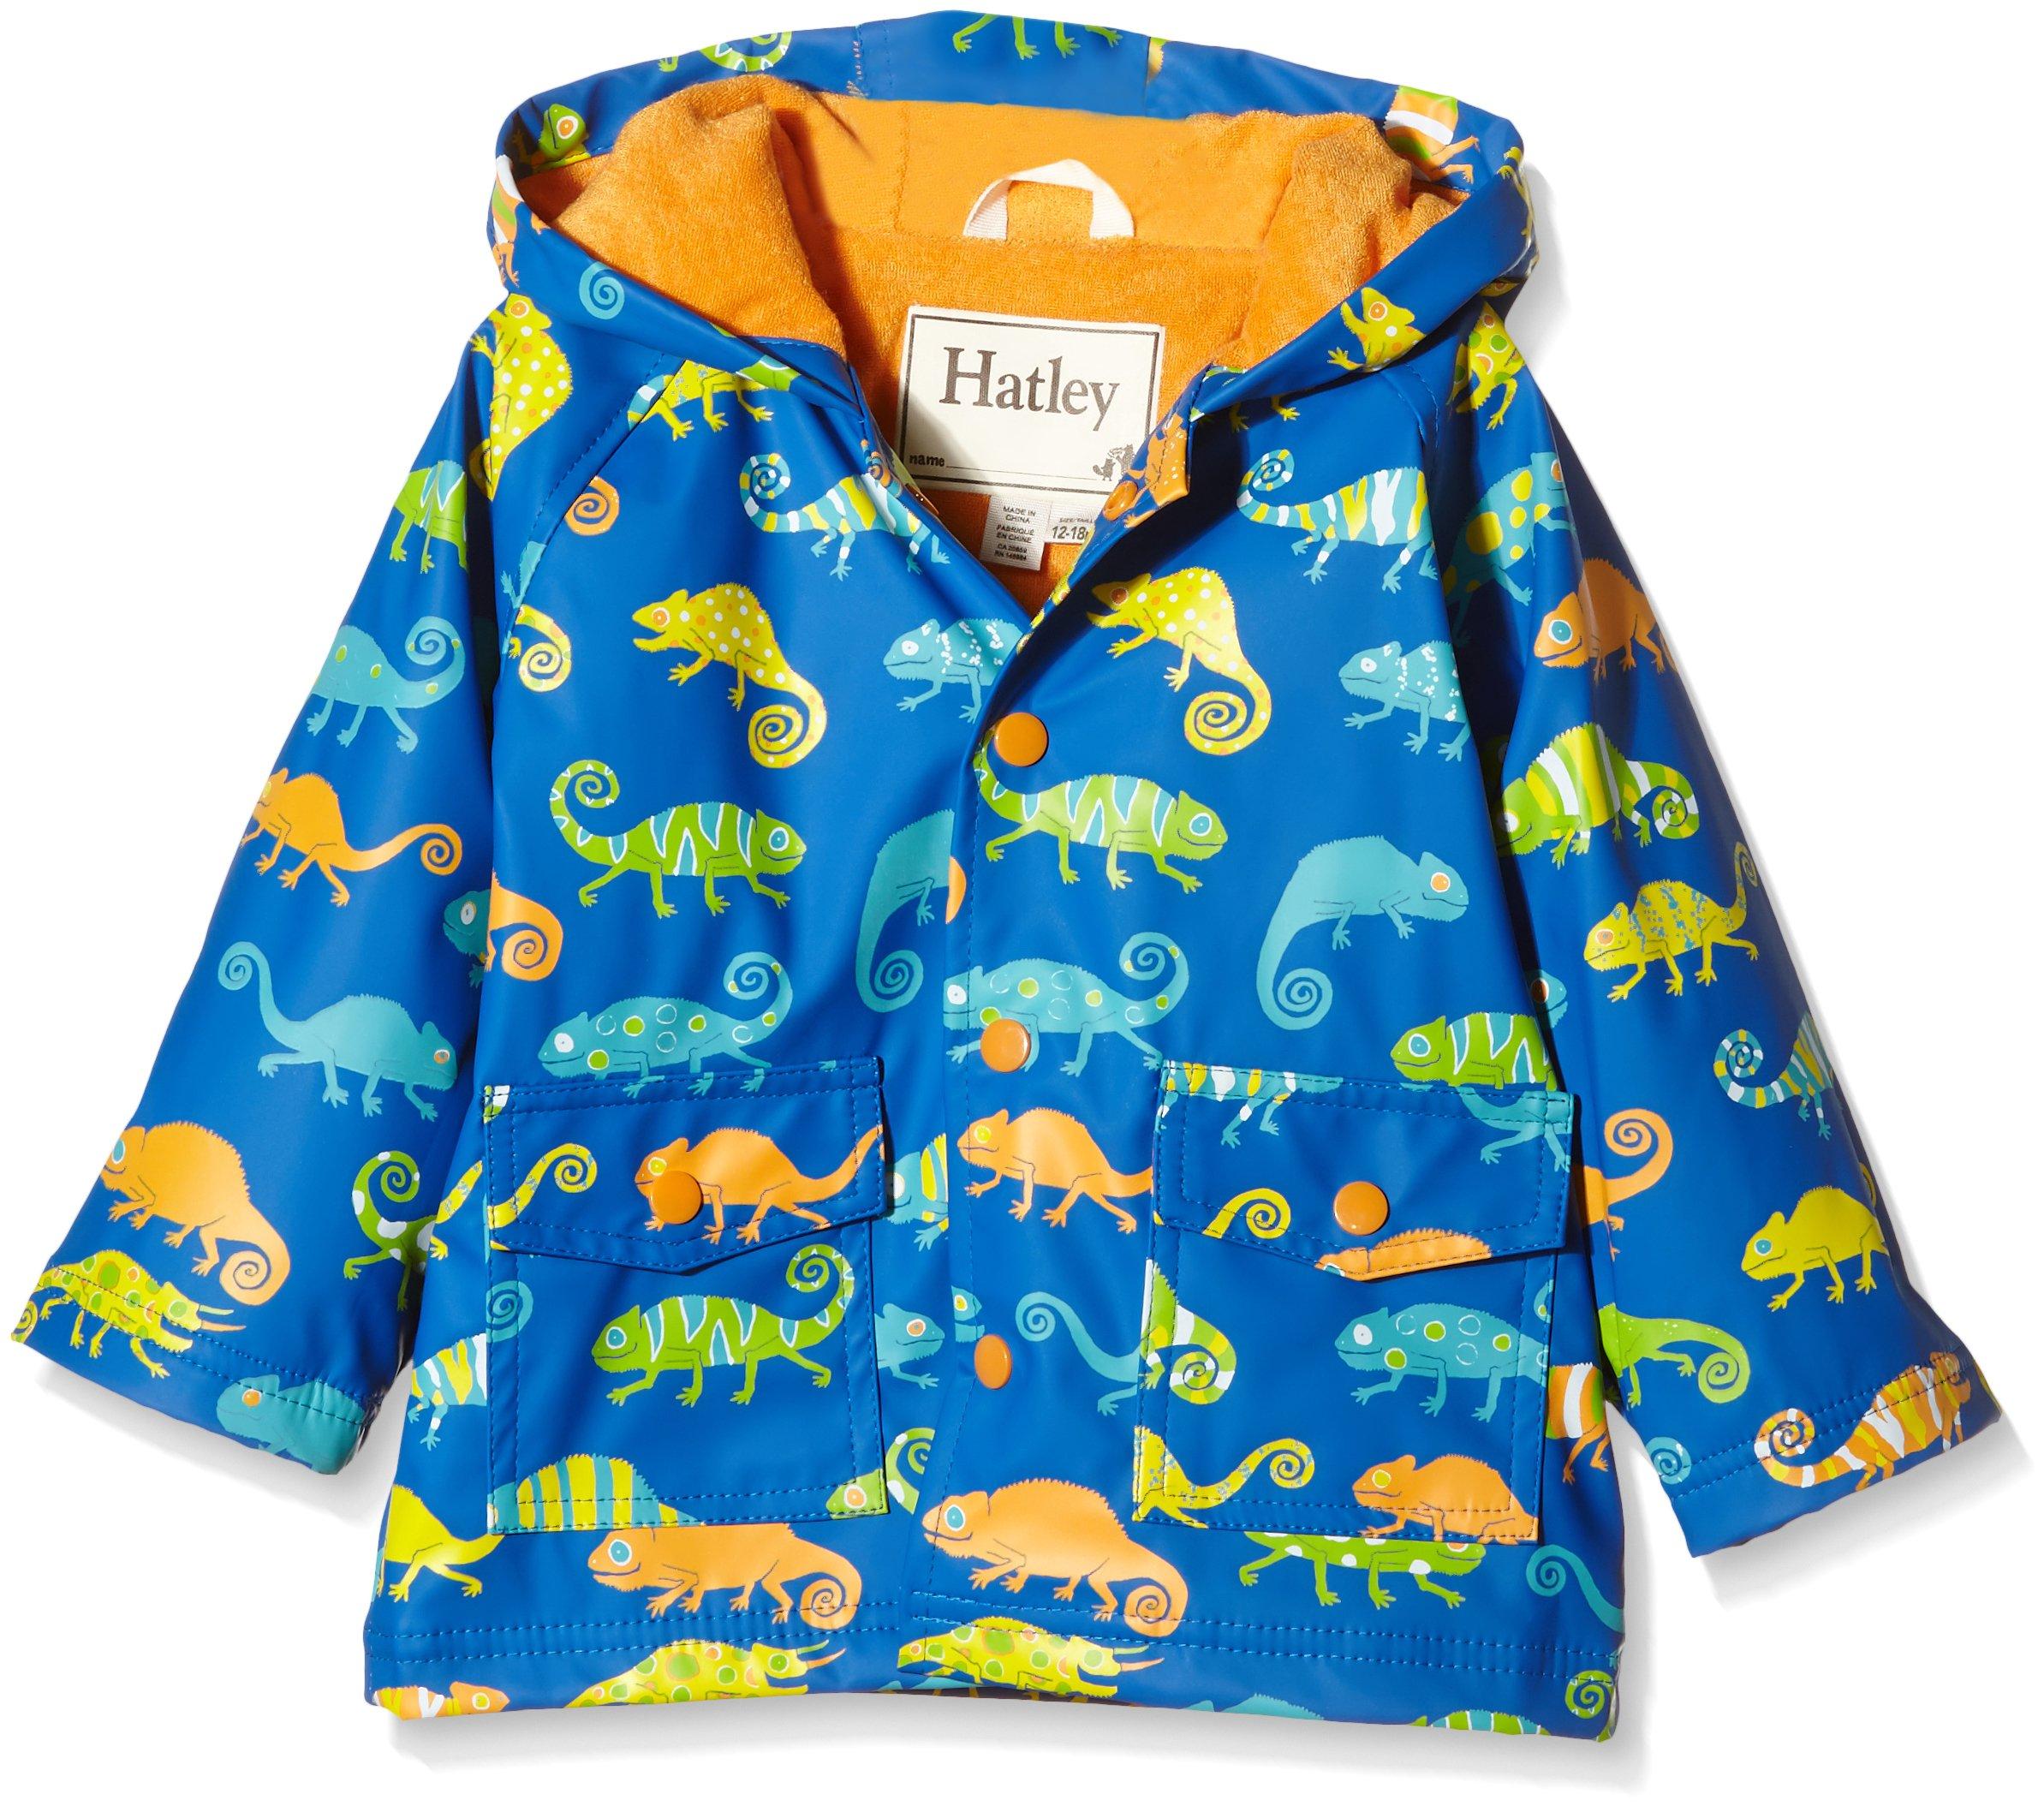 Hatley Baby Boys' Crazy Chameleons Infant Raincoat, Blue, 6-12 Months by Hatley